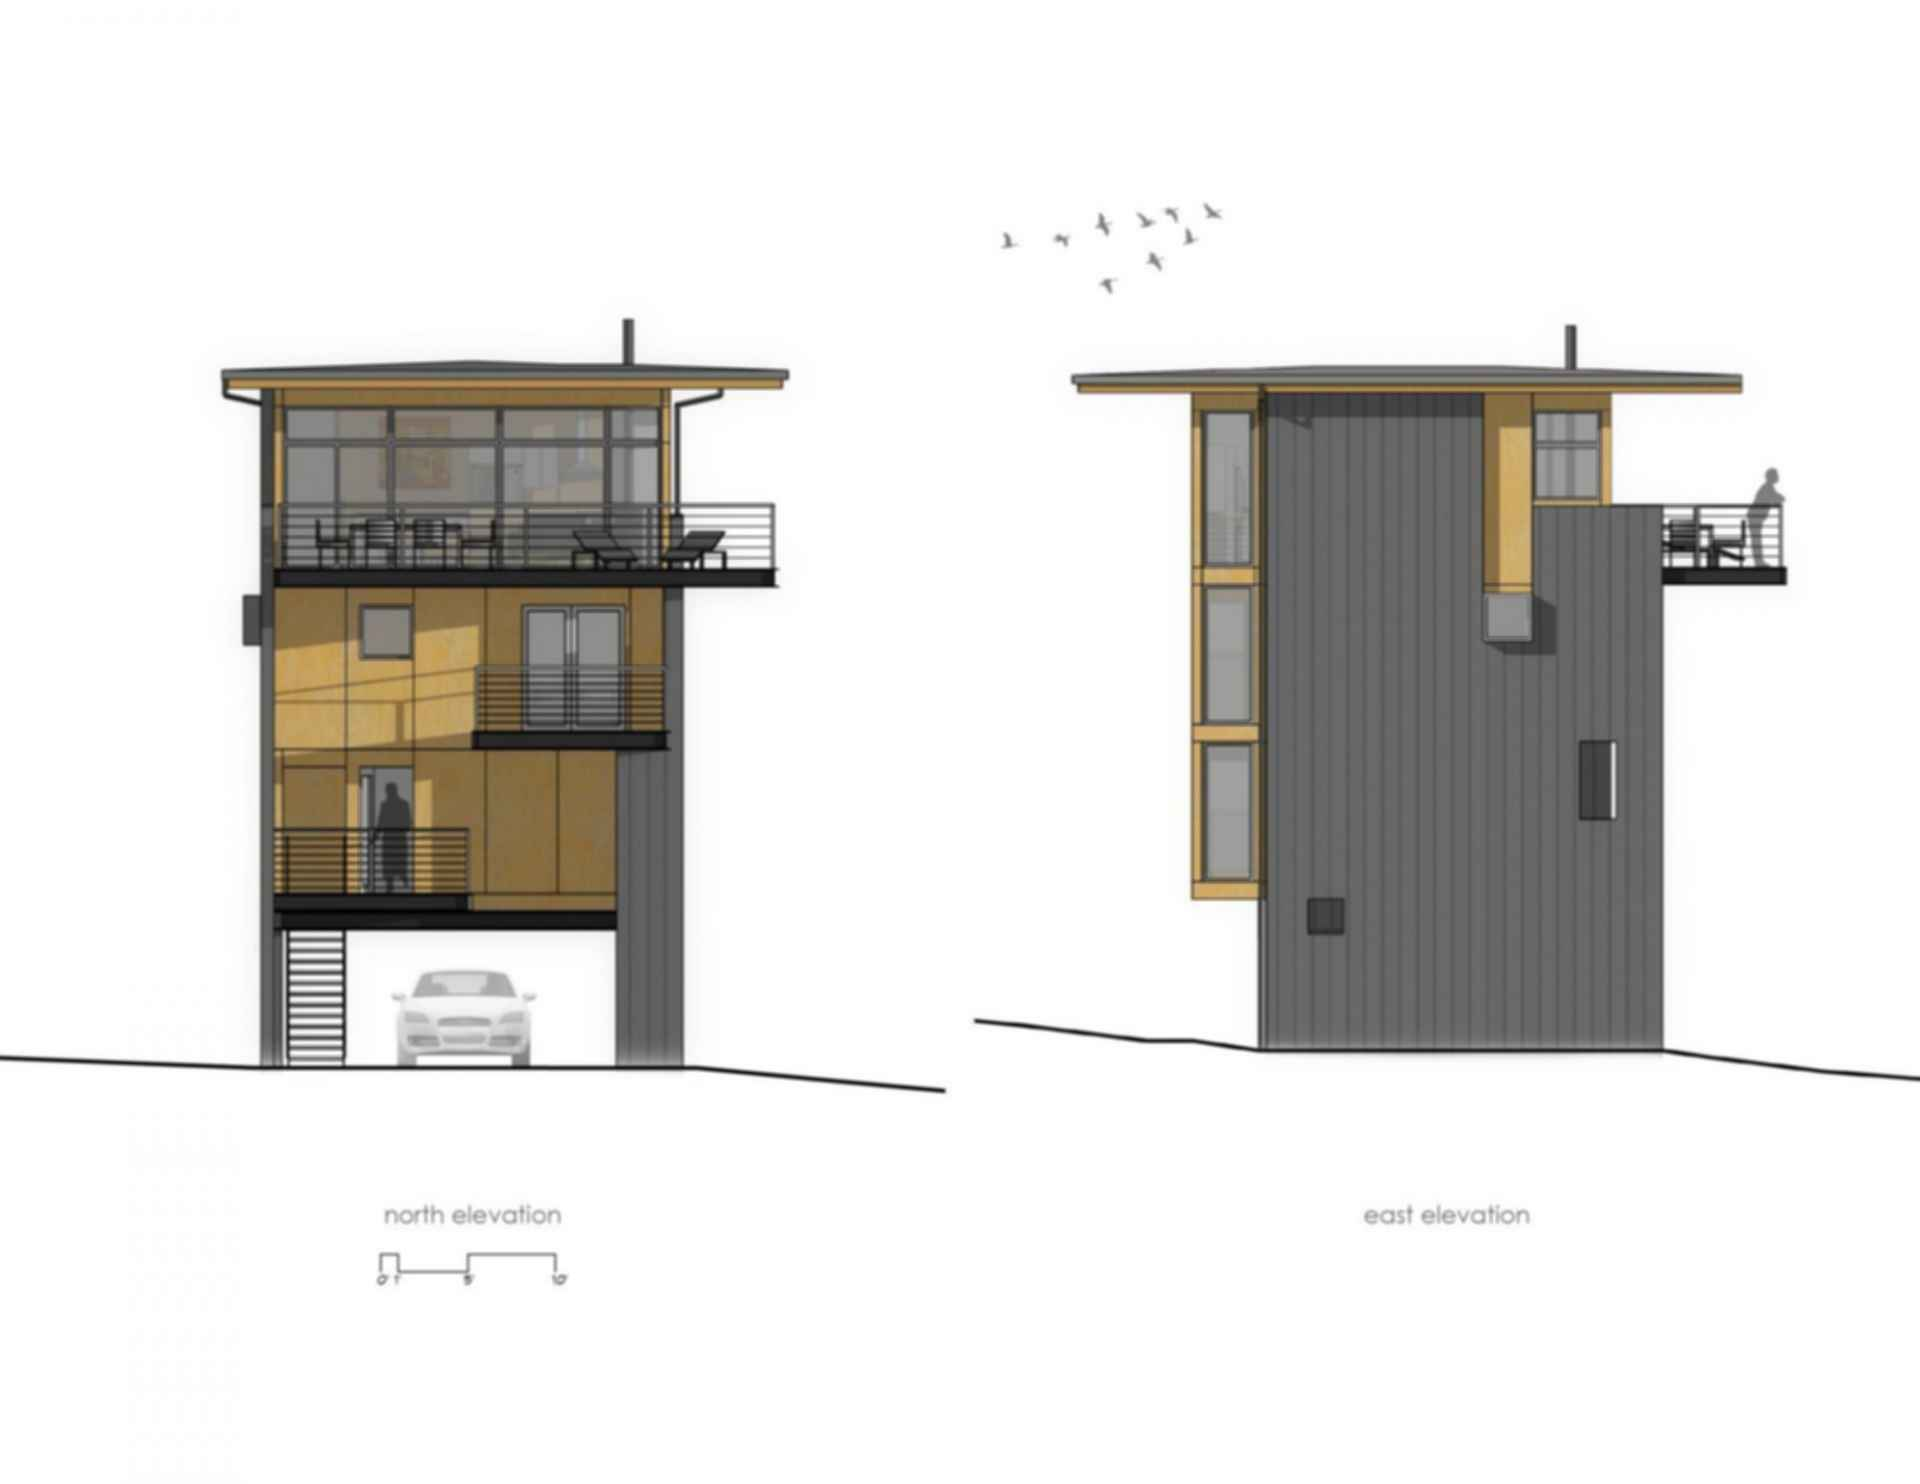 Glen Lake Tower - Concept Design